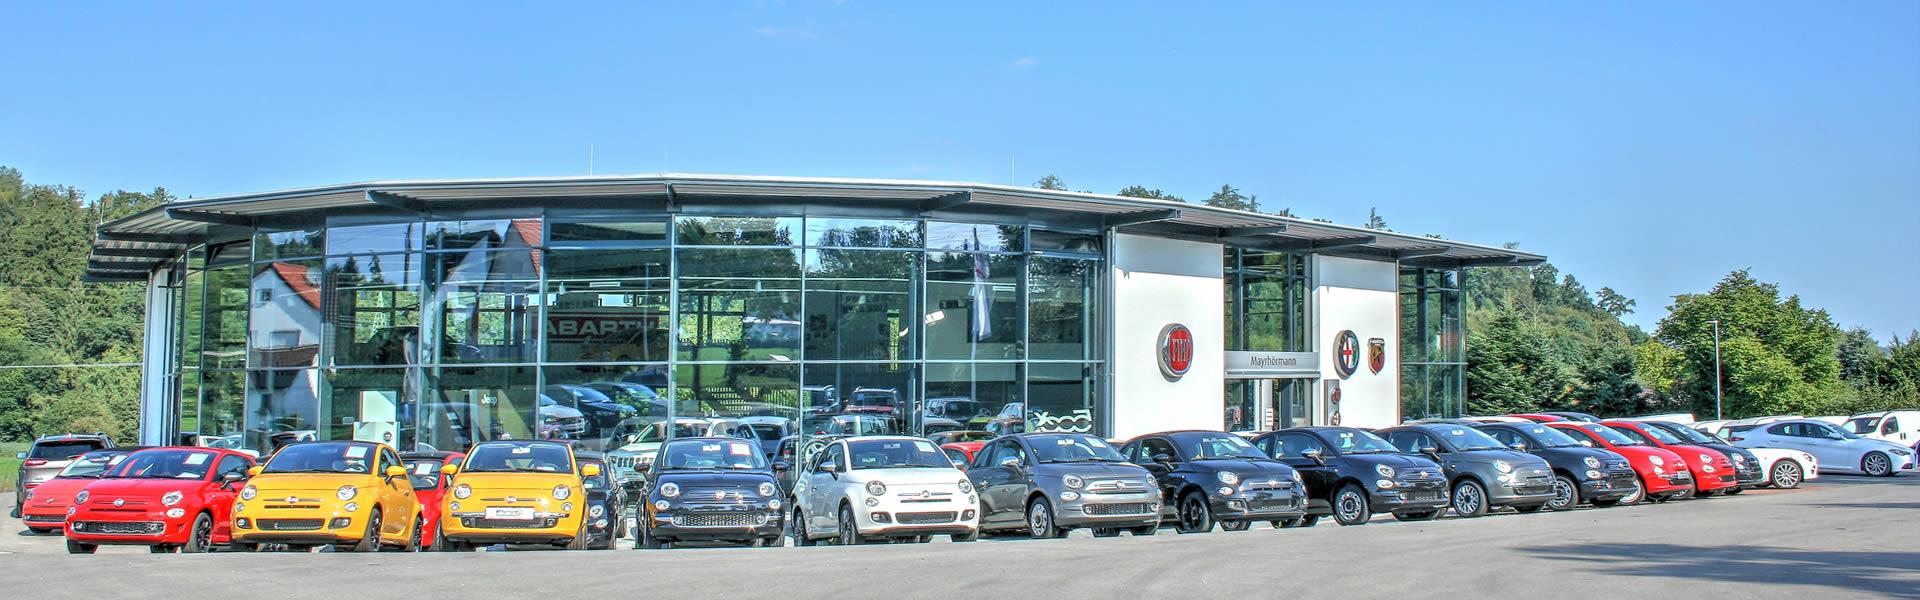 Showroom Autohaus Mayrhoermann Gmbh   Diedorf/Biburg